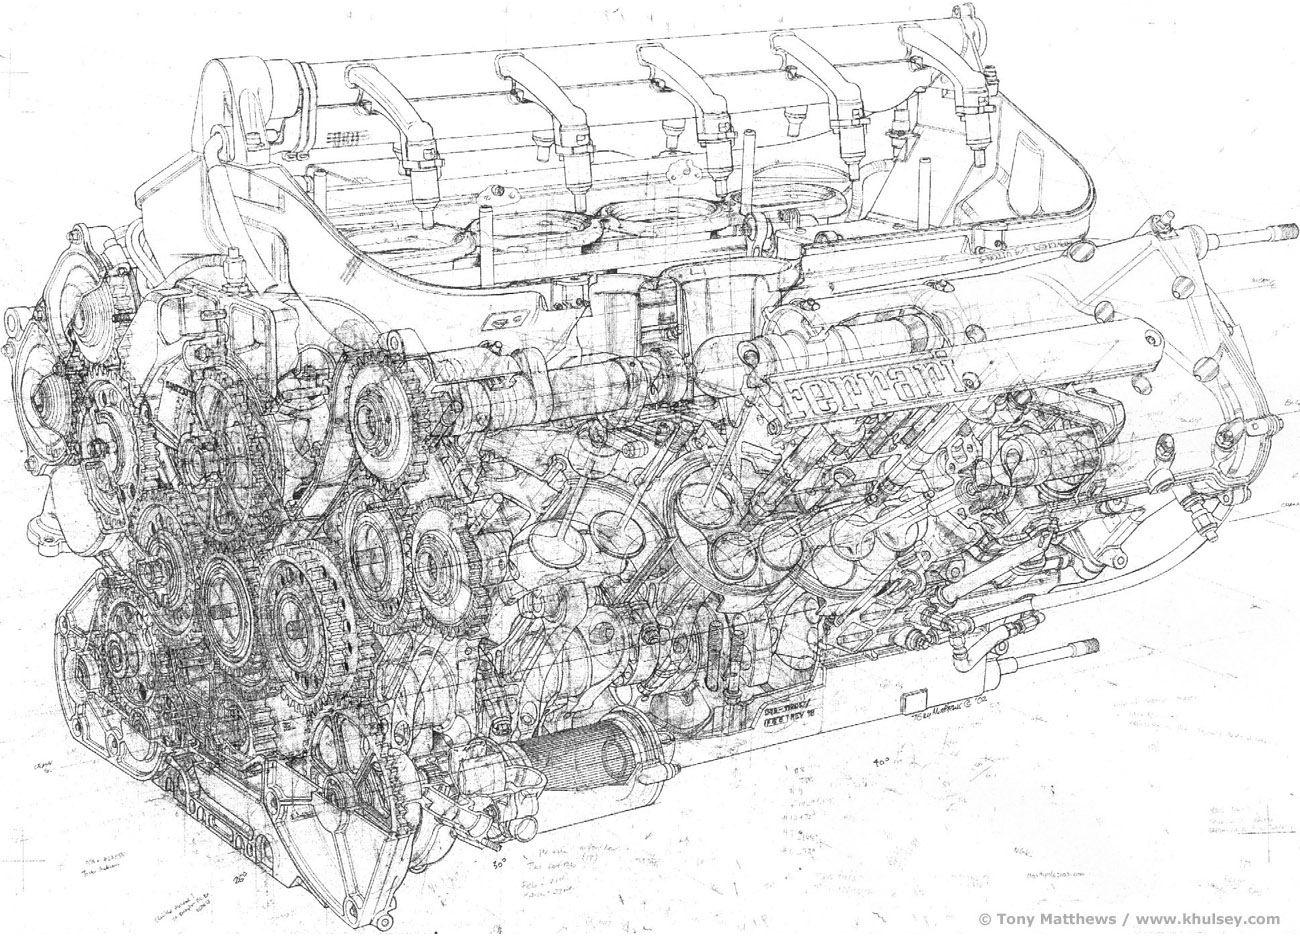 small resolution of ferrari engine diagram wiring diagram today ferrari engine diagram ferrari engine diagram